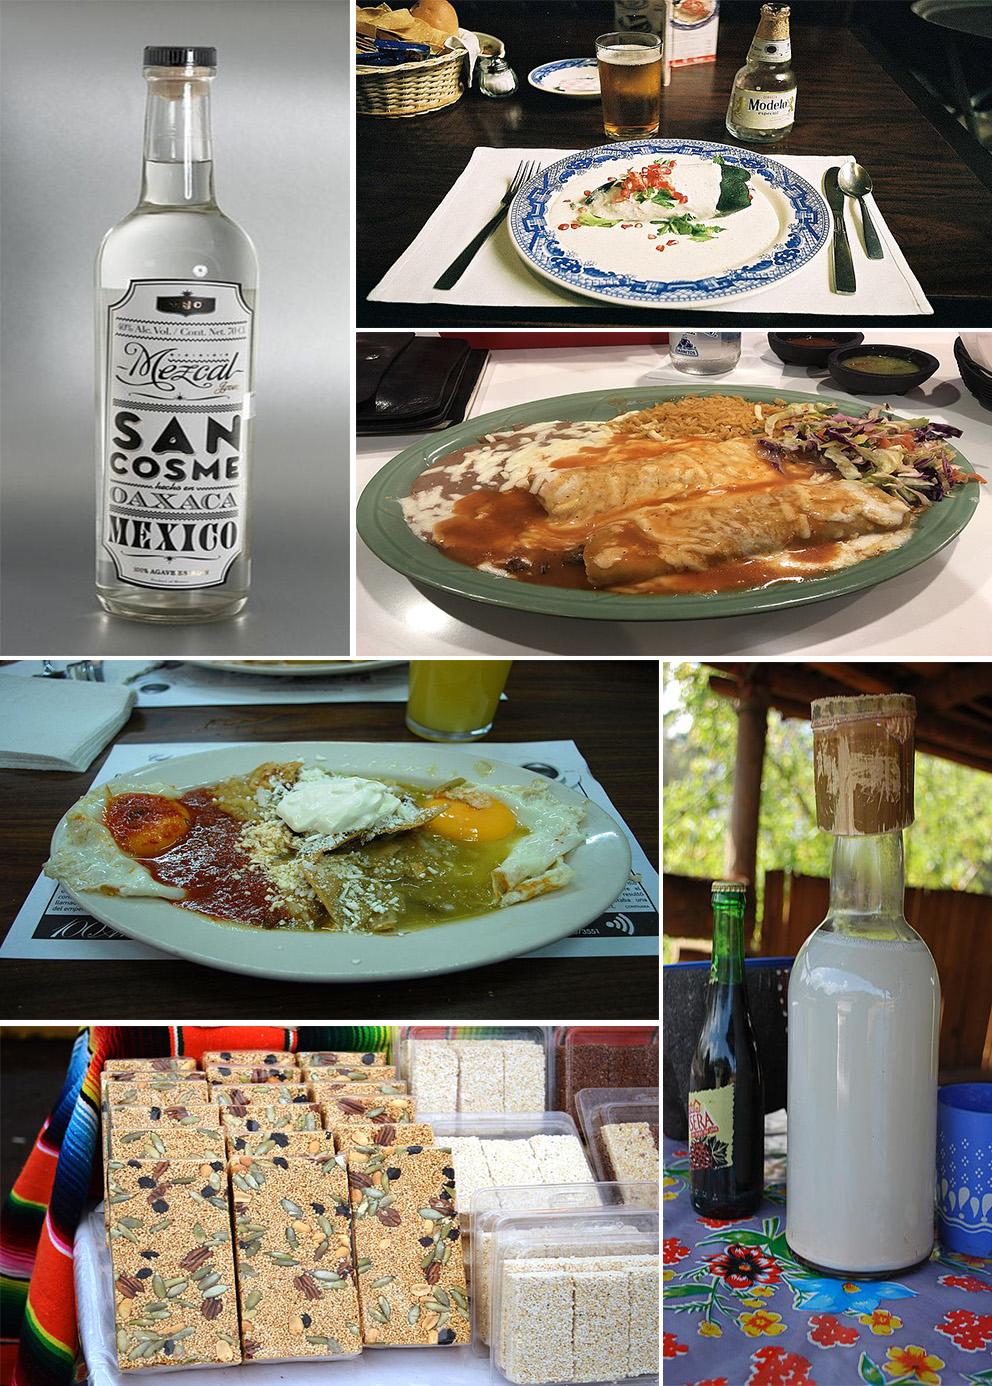 Gastronomía De México Wikipedia La Enciclopedia Libre